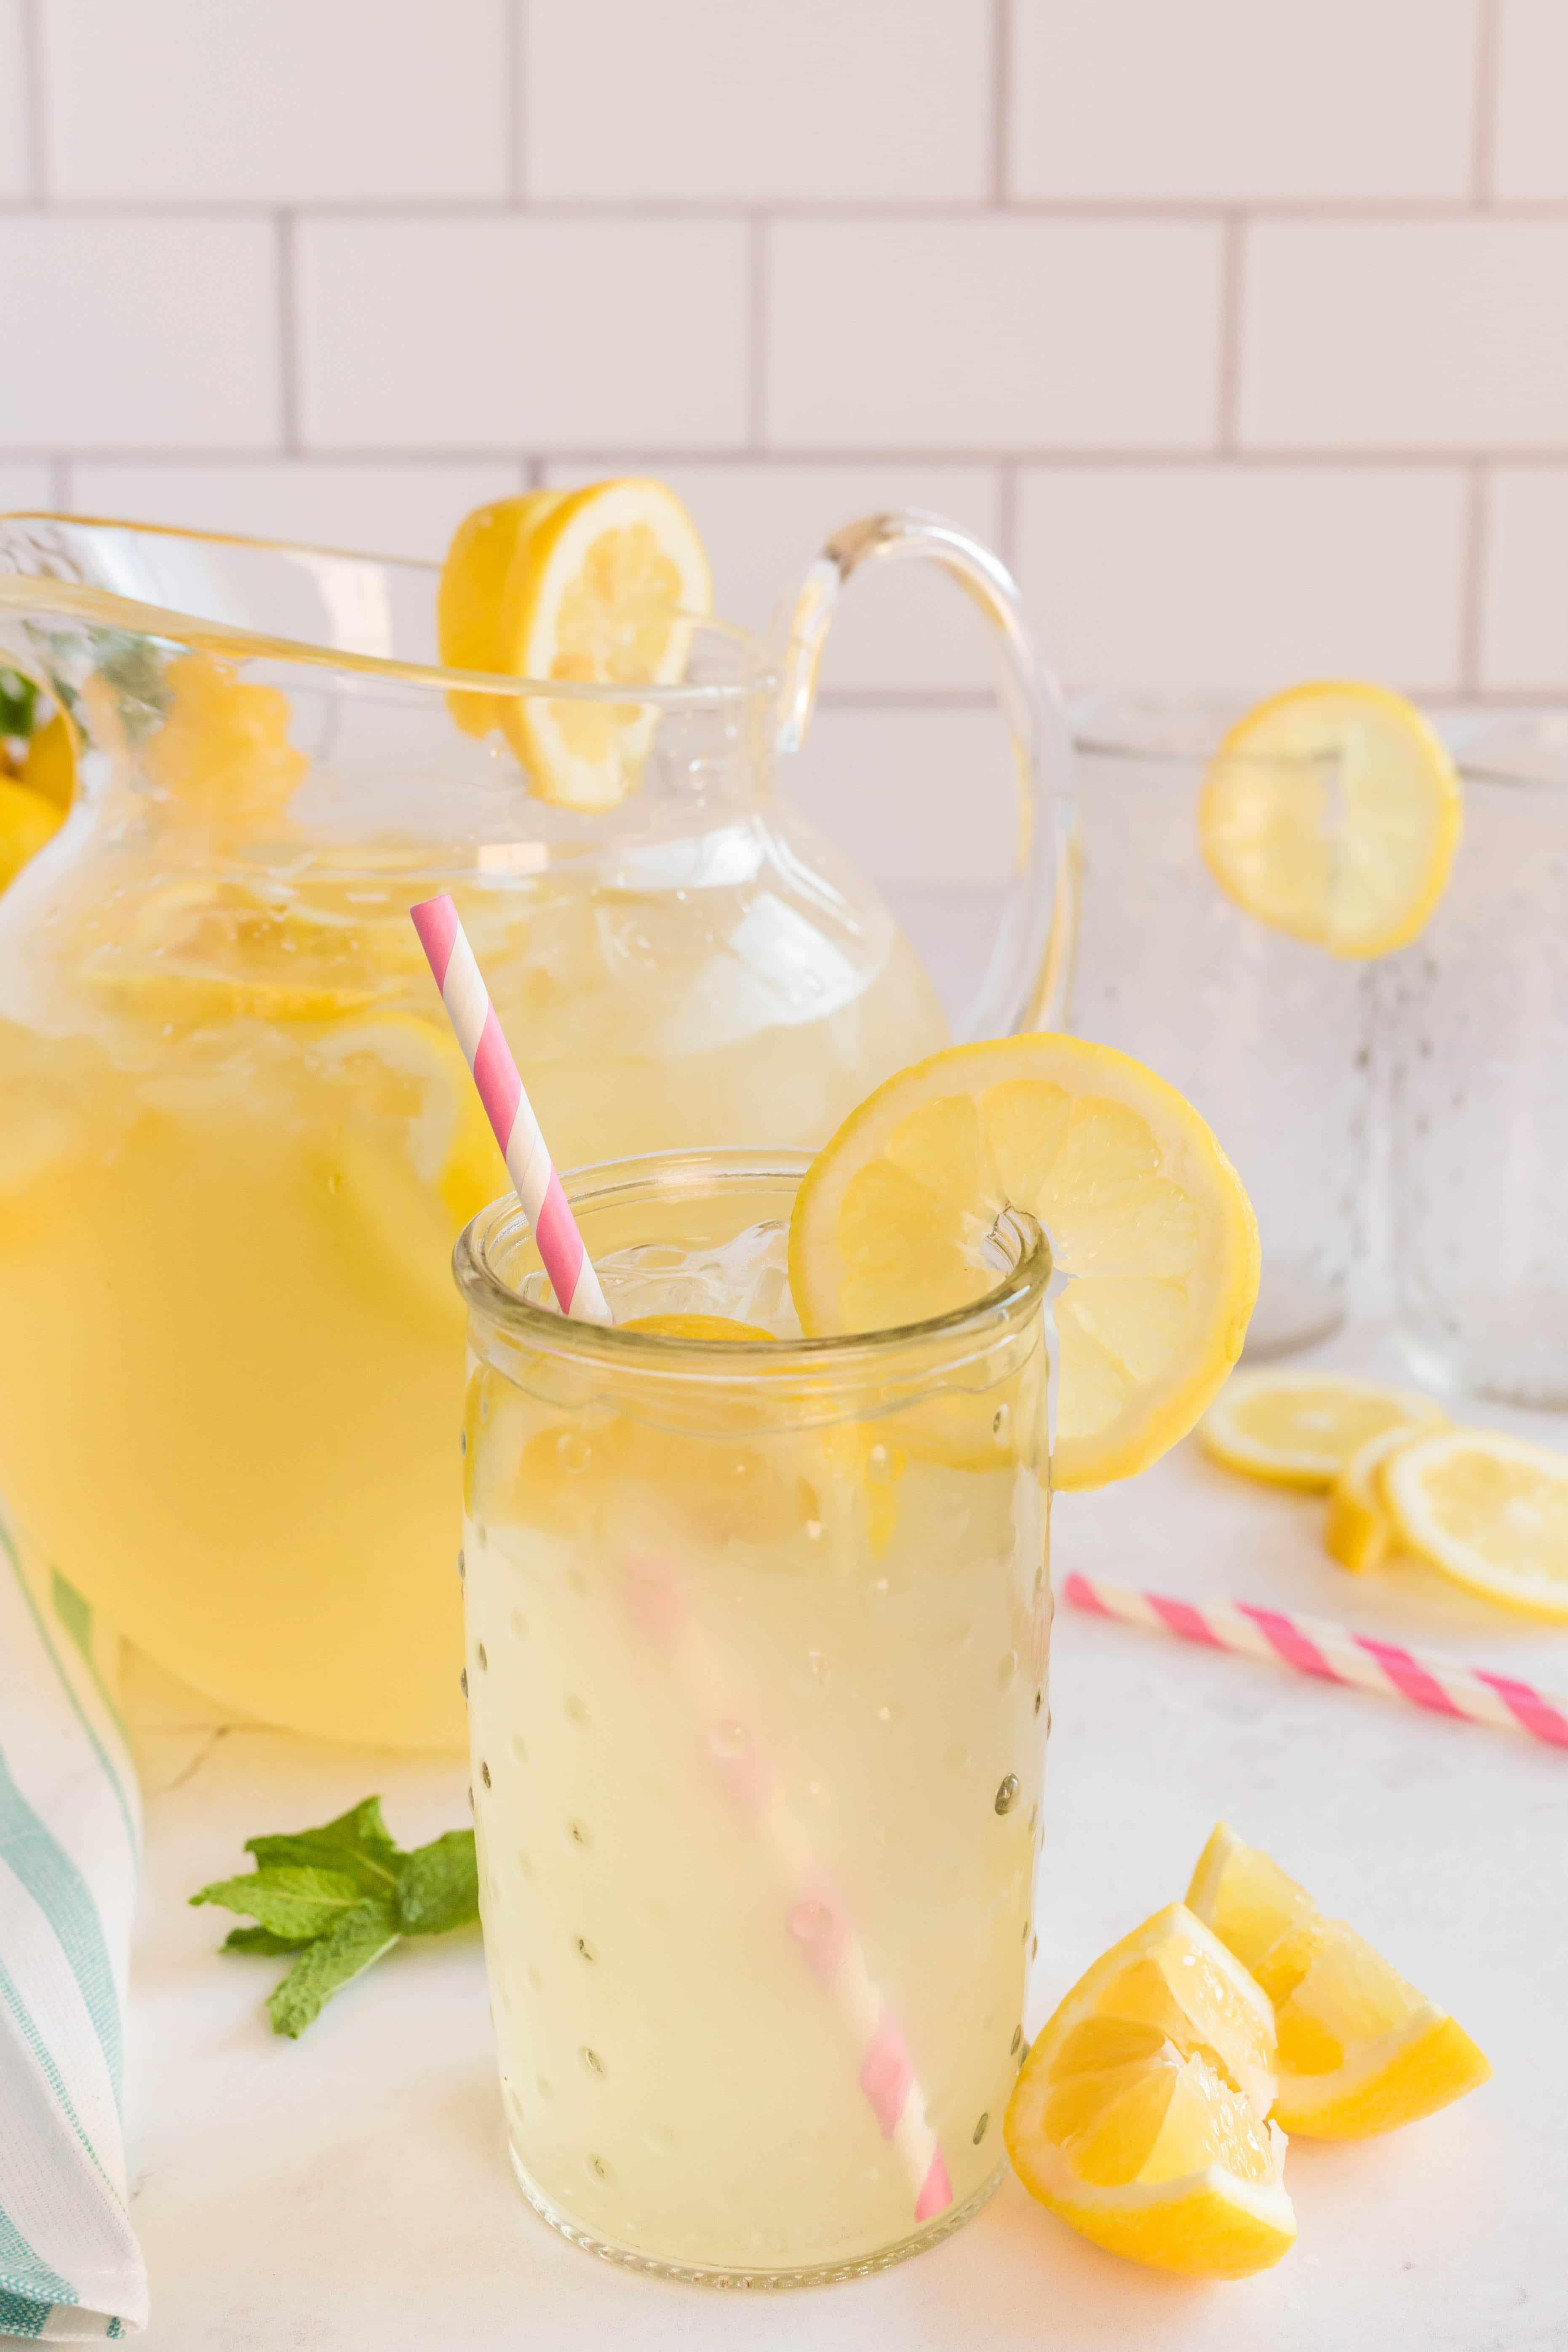 serving of lemonade in glass